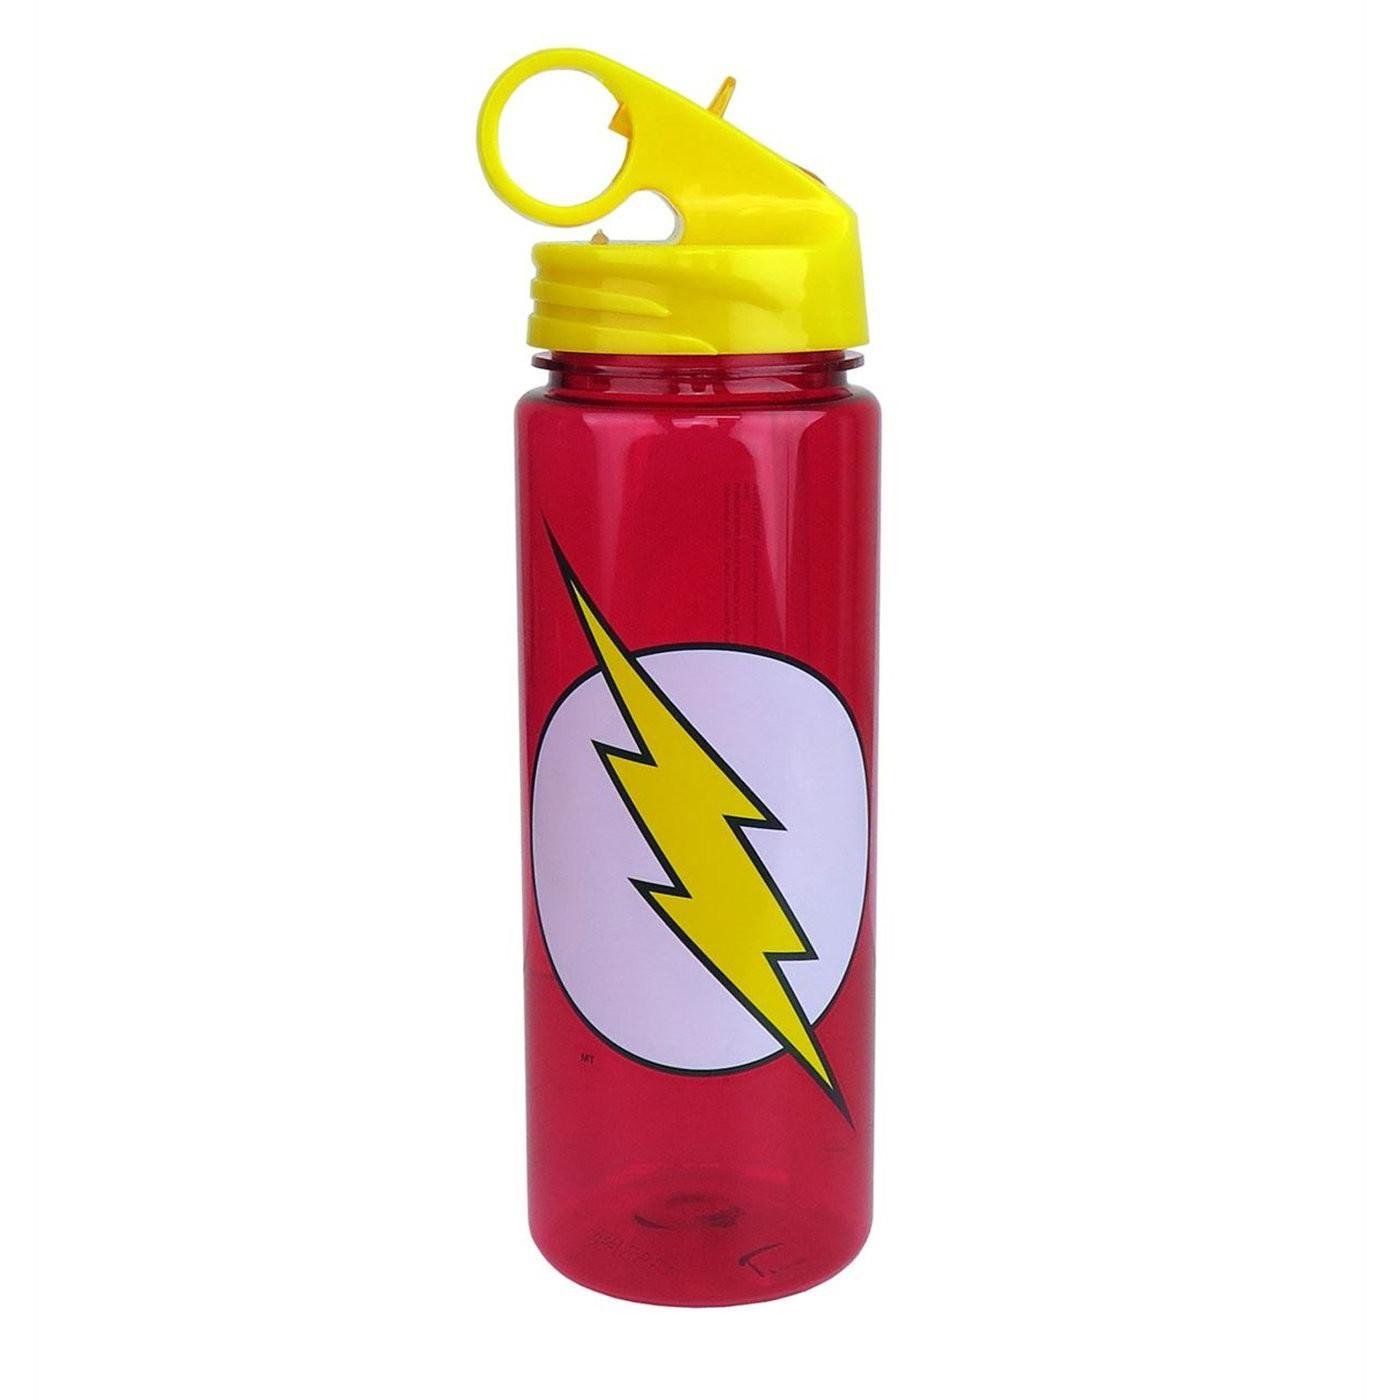 symbol 20oz water bottle red